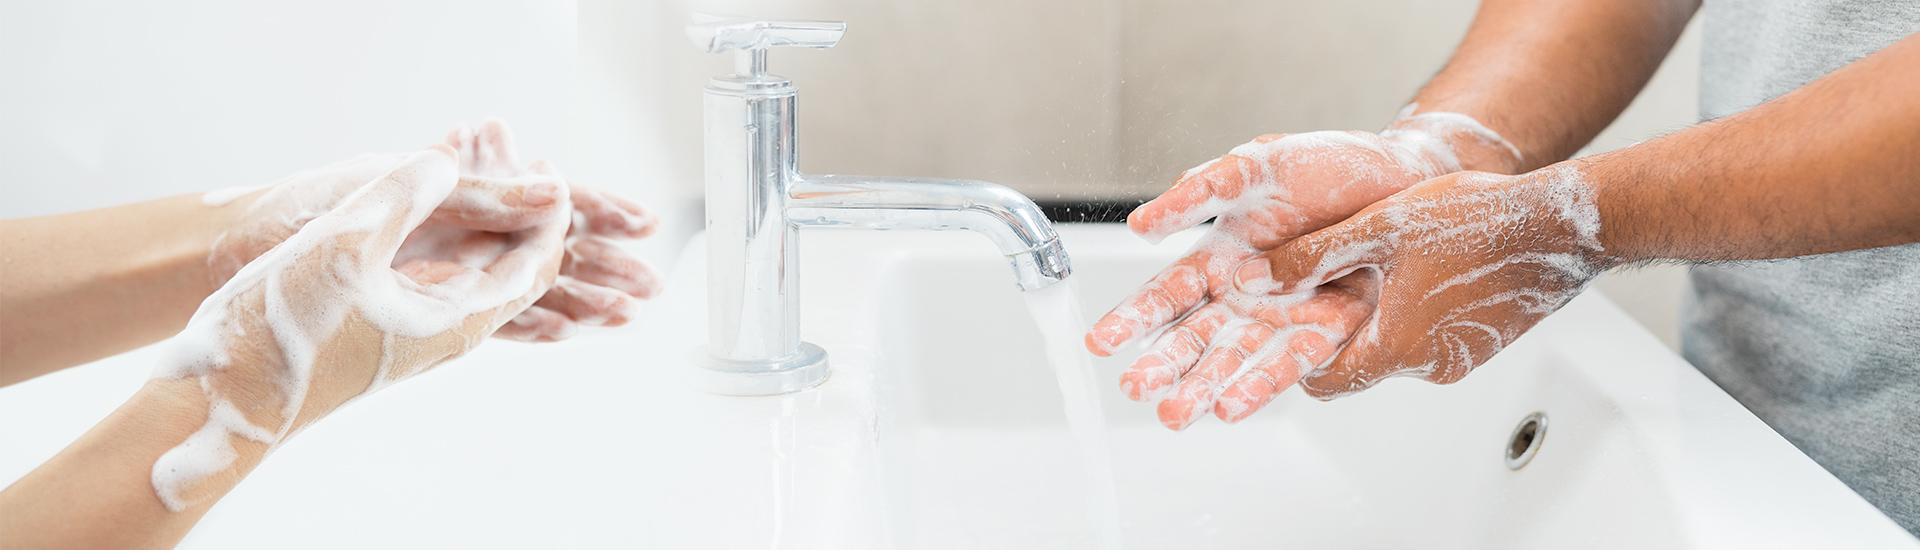 Lavage des mains HYCODIS Covid19